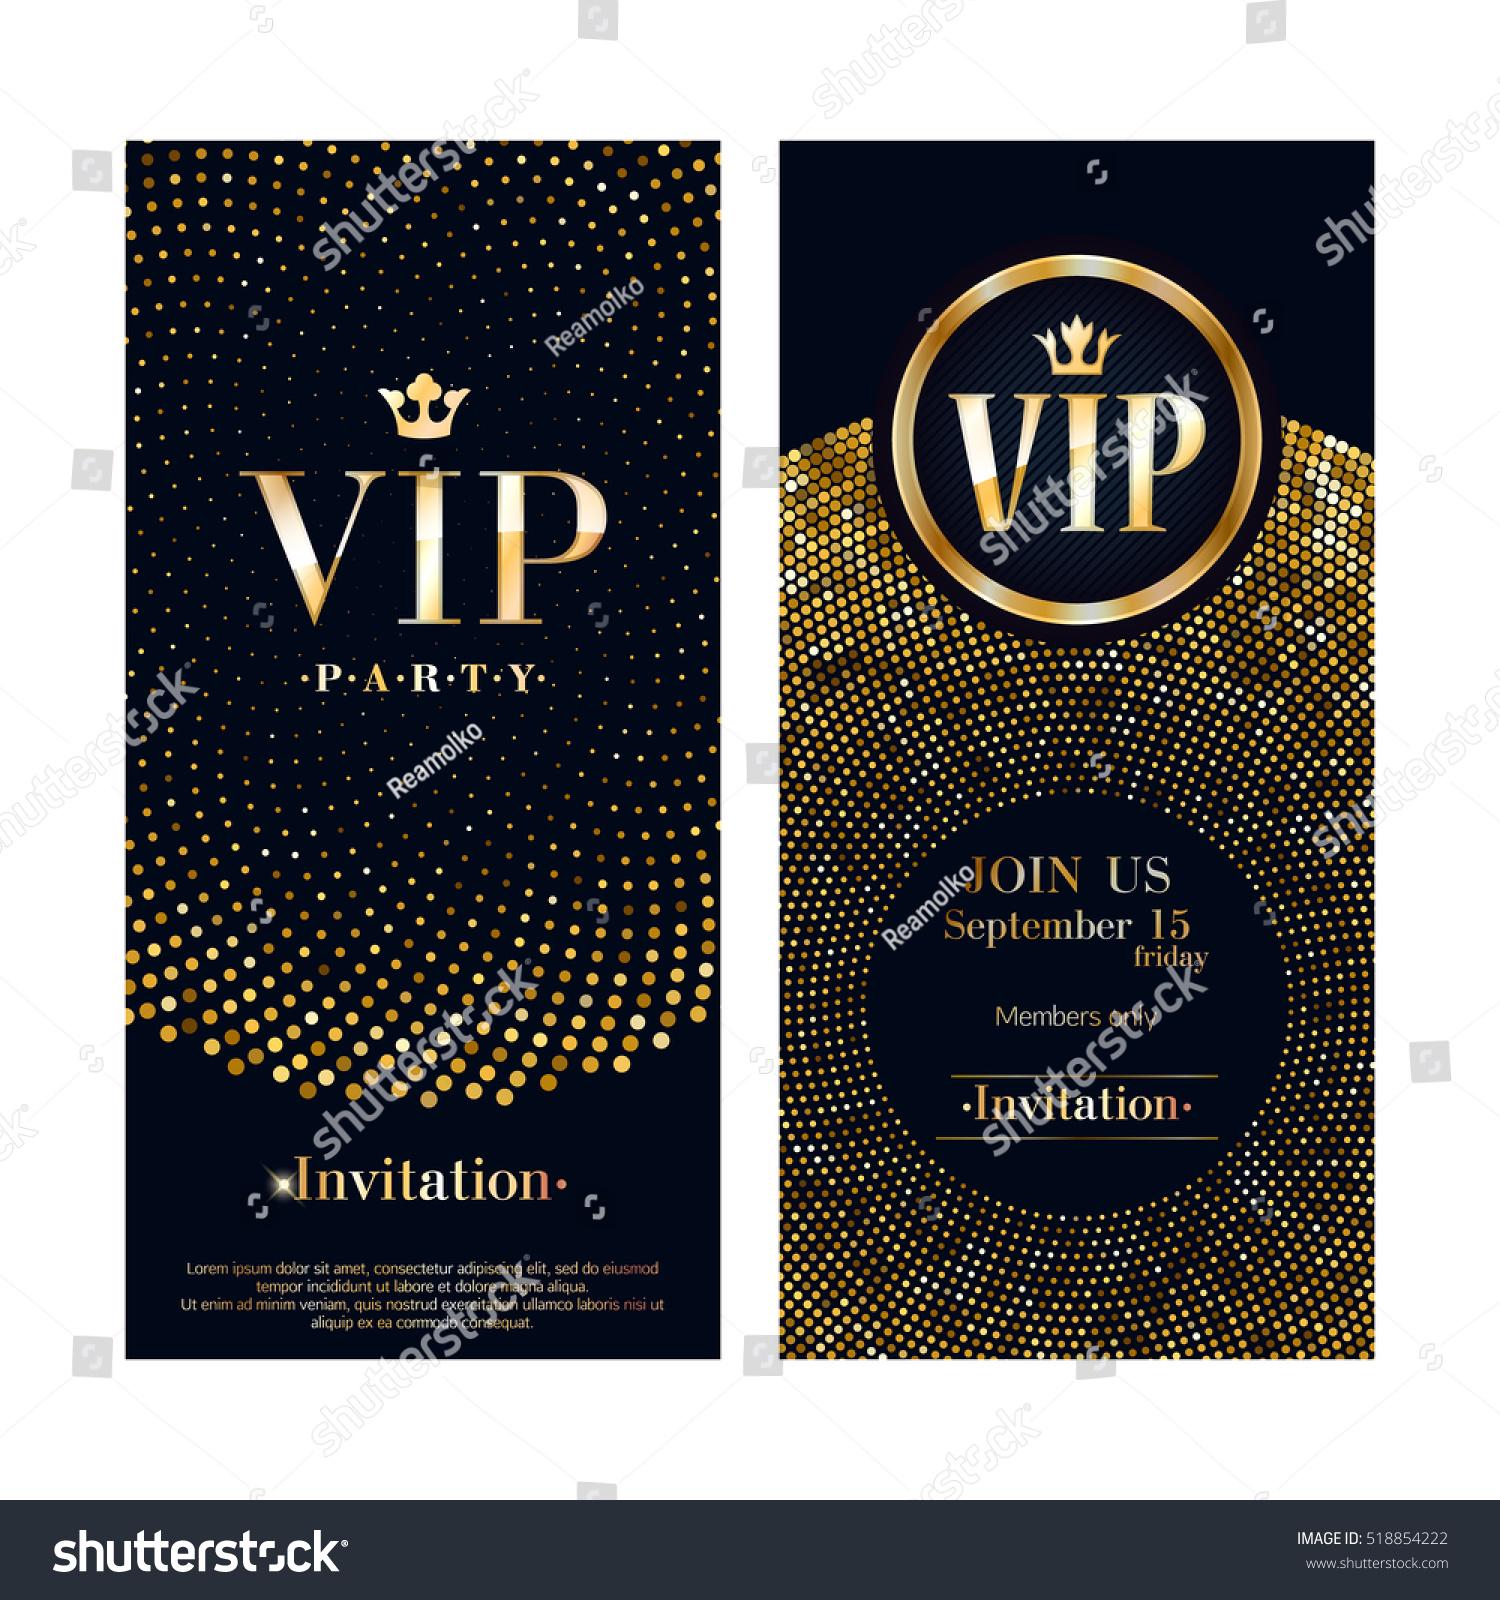 vip club party premium invitation card stock vector 518854222 shutterstock. Black Bedroom Furniture Sets. Home Design Ideas